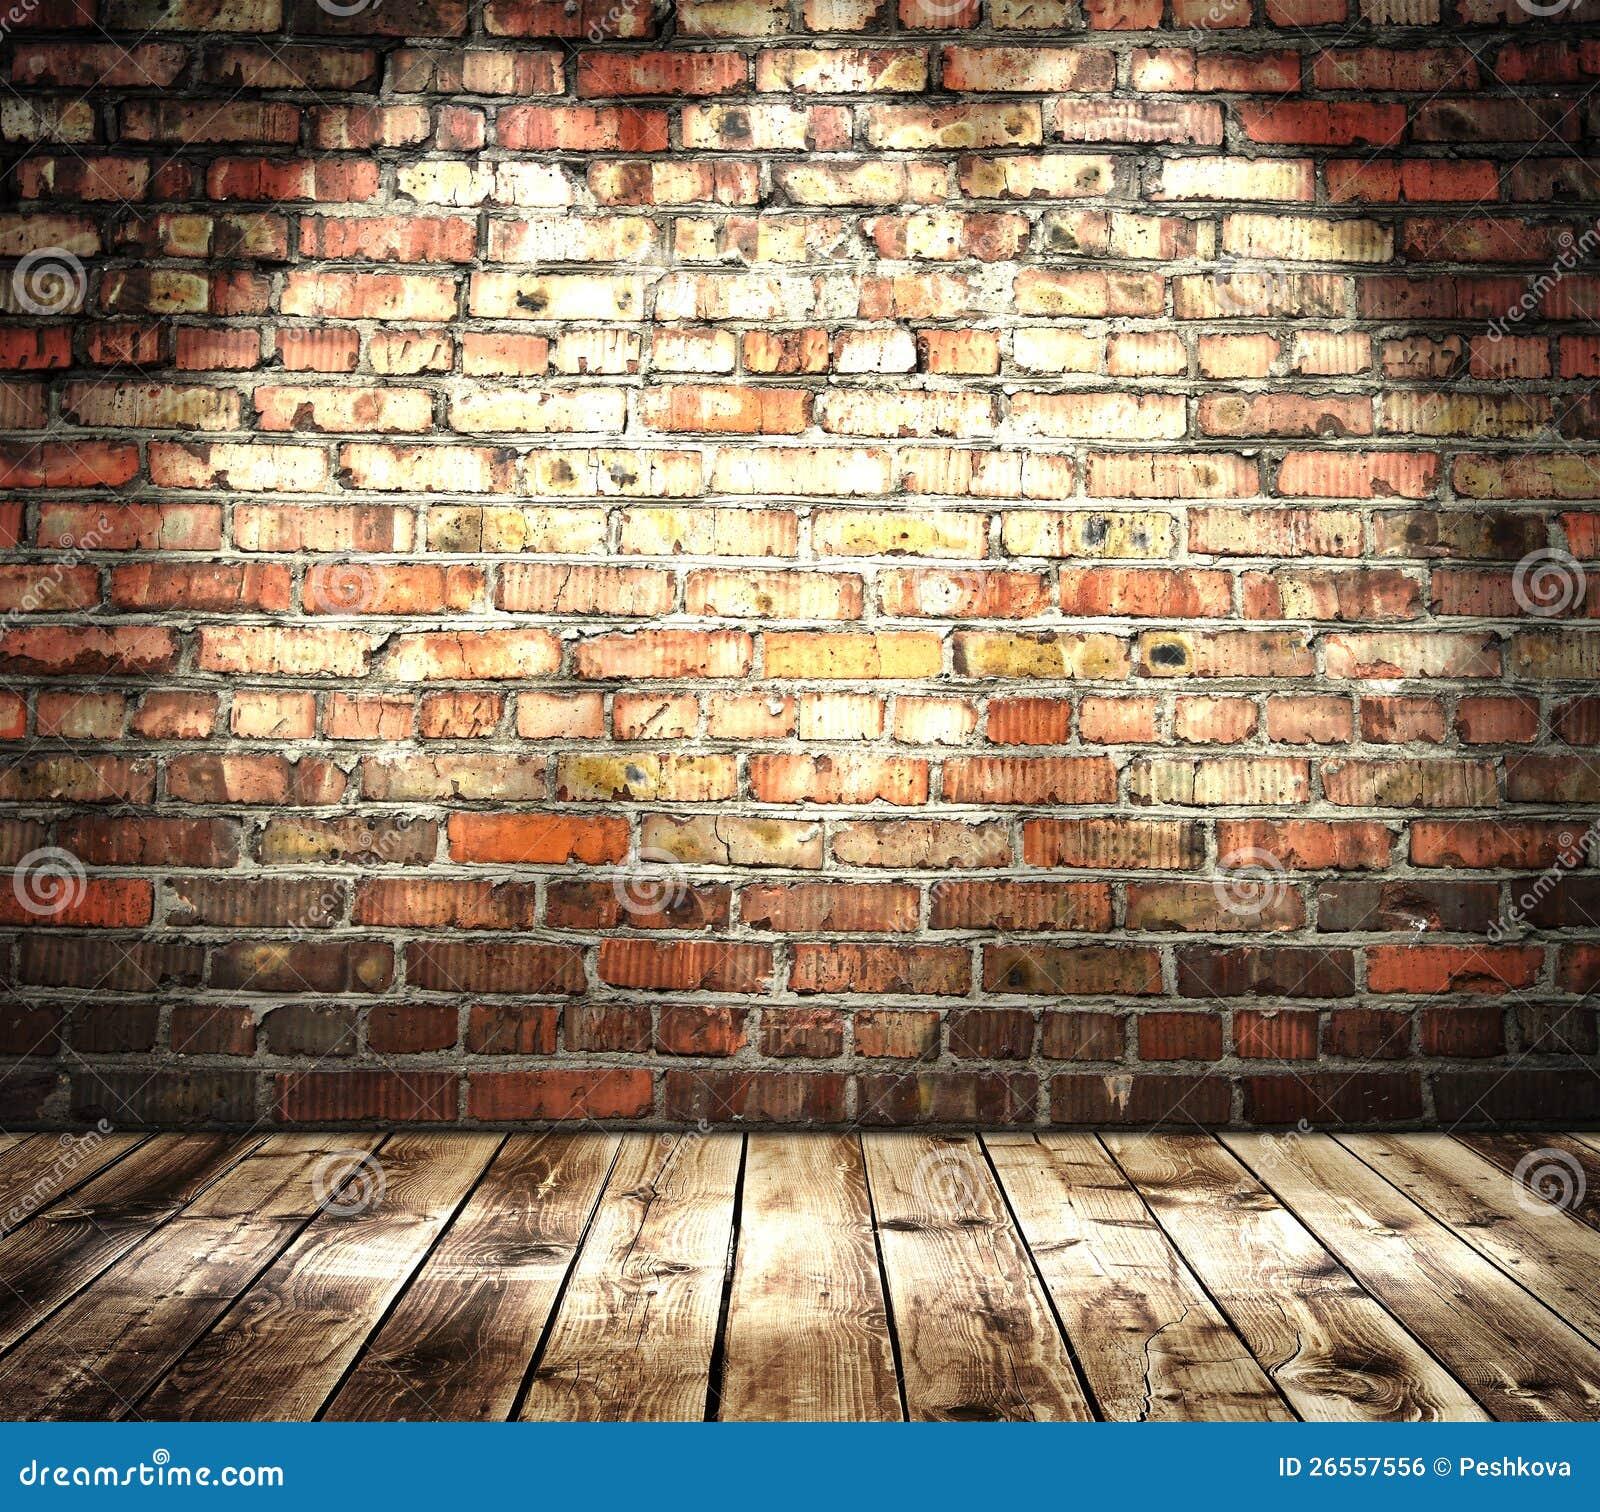 Color Brick Wall Royalty Free Stock Image